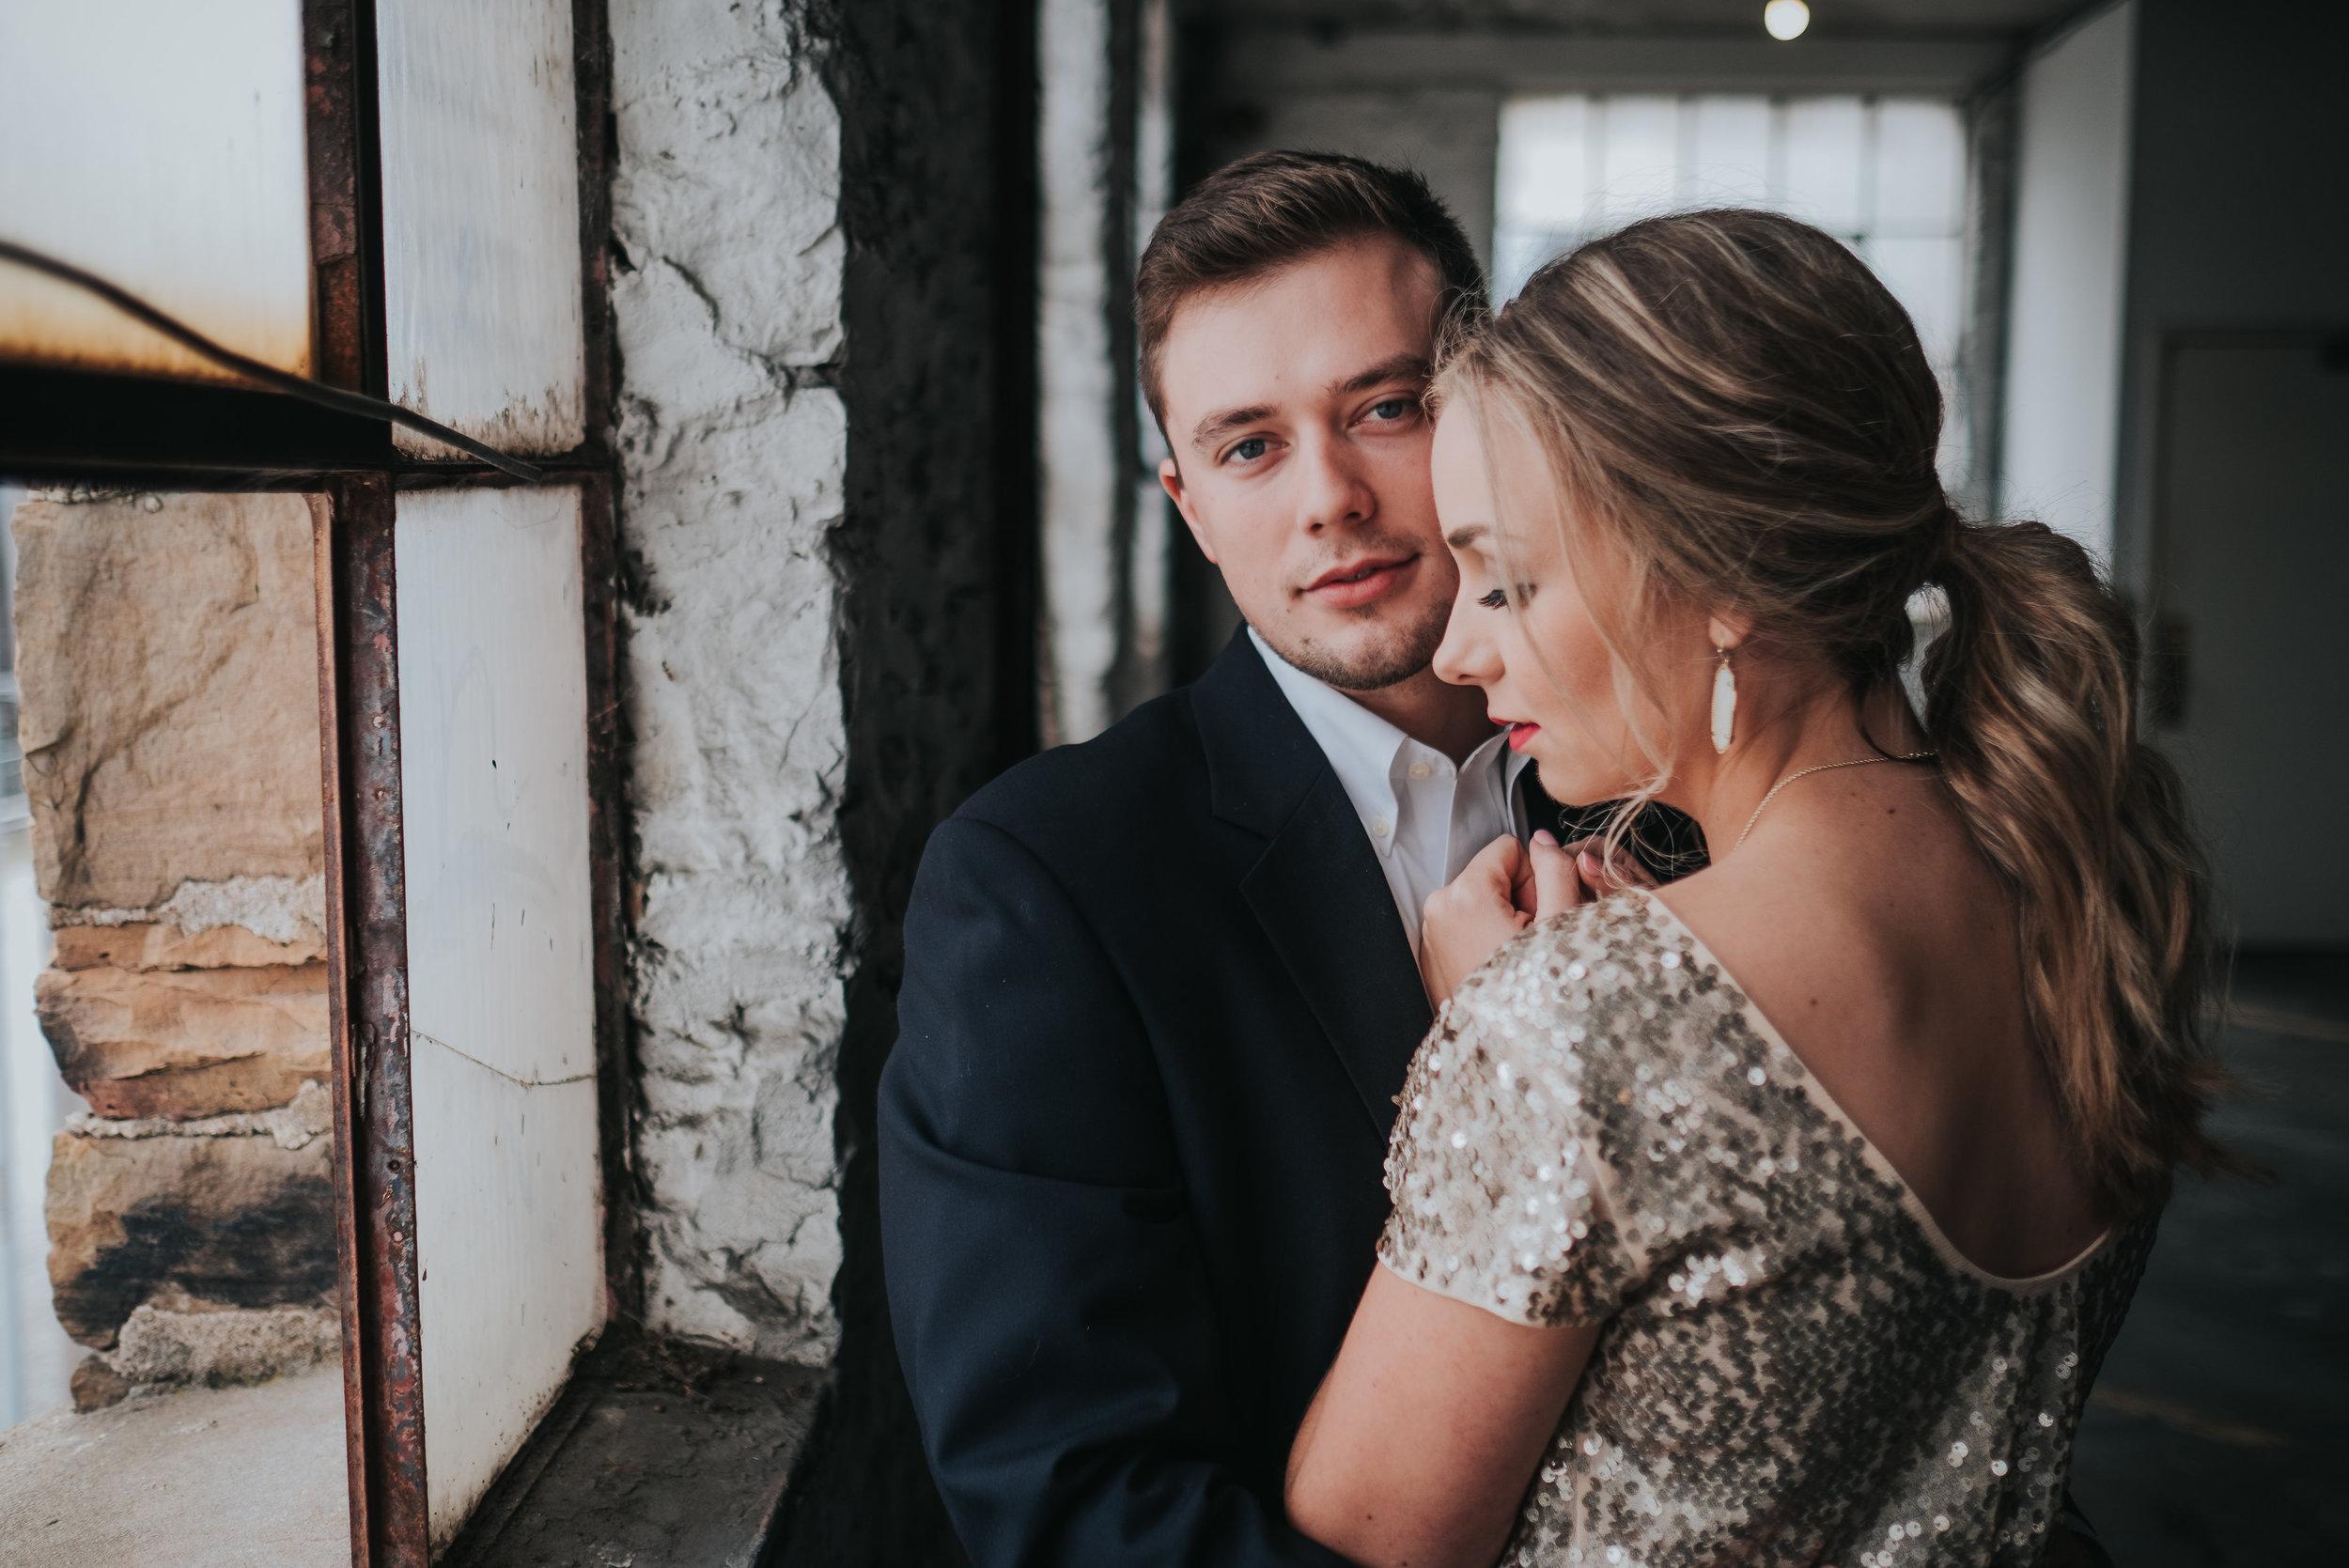 Matt.Mackenzie.Engagement.2017TheStirewalts.com-164.jpg